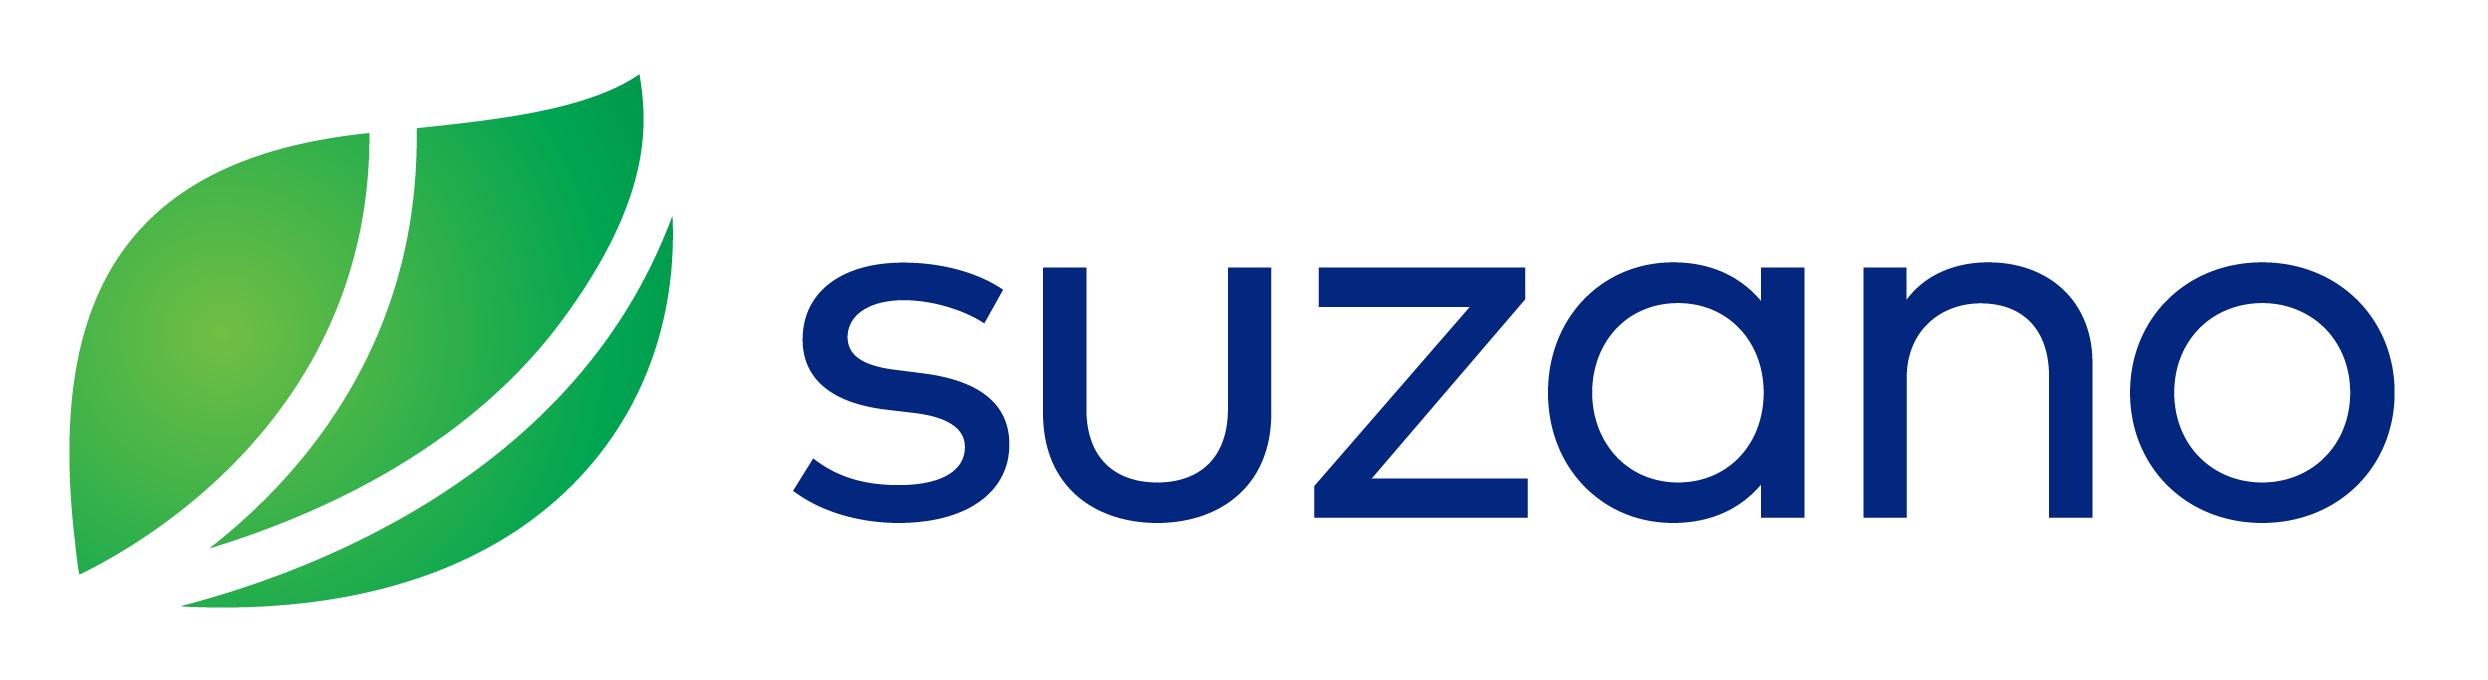 suzano-logo-lbox-2488x680-ffffff